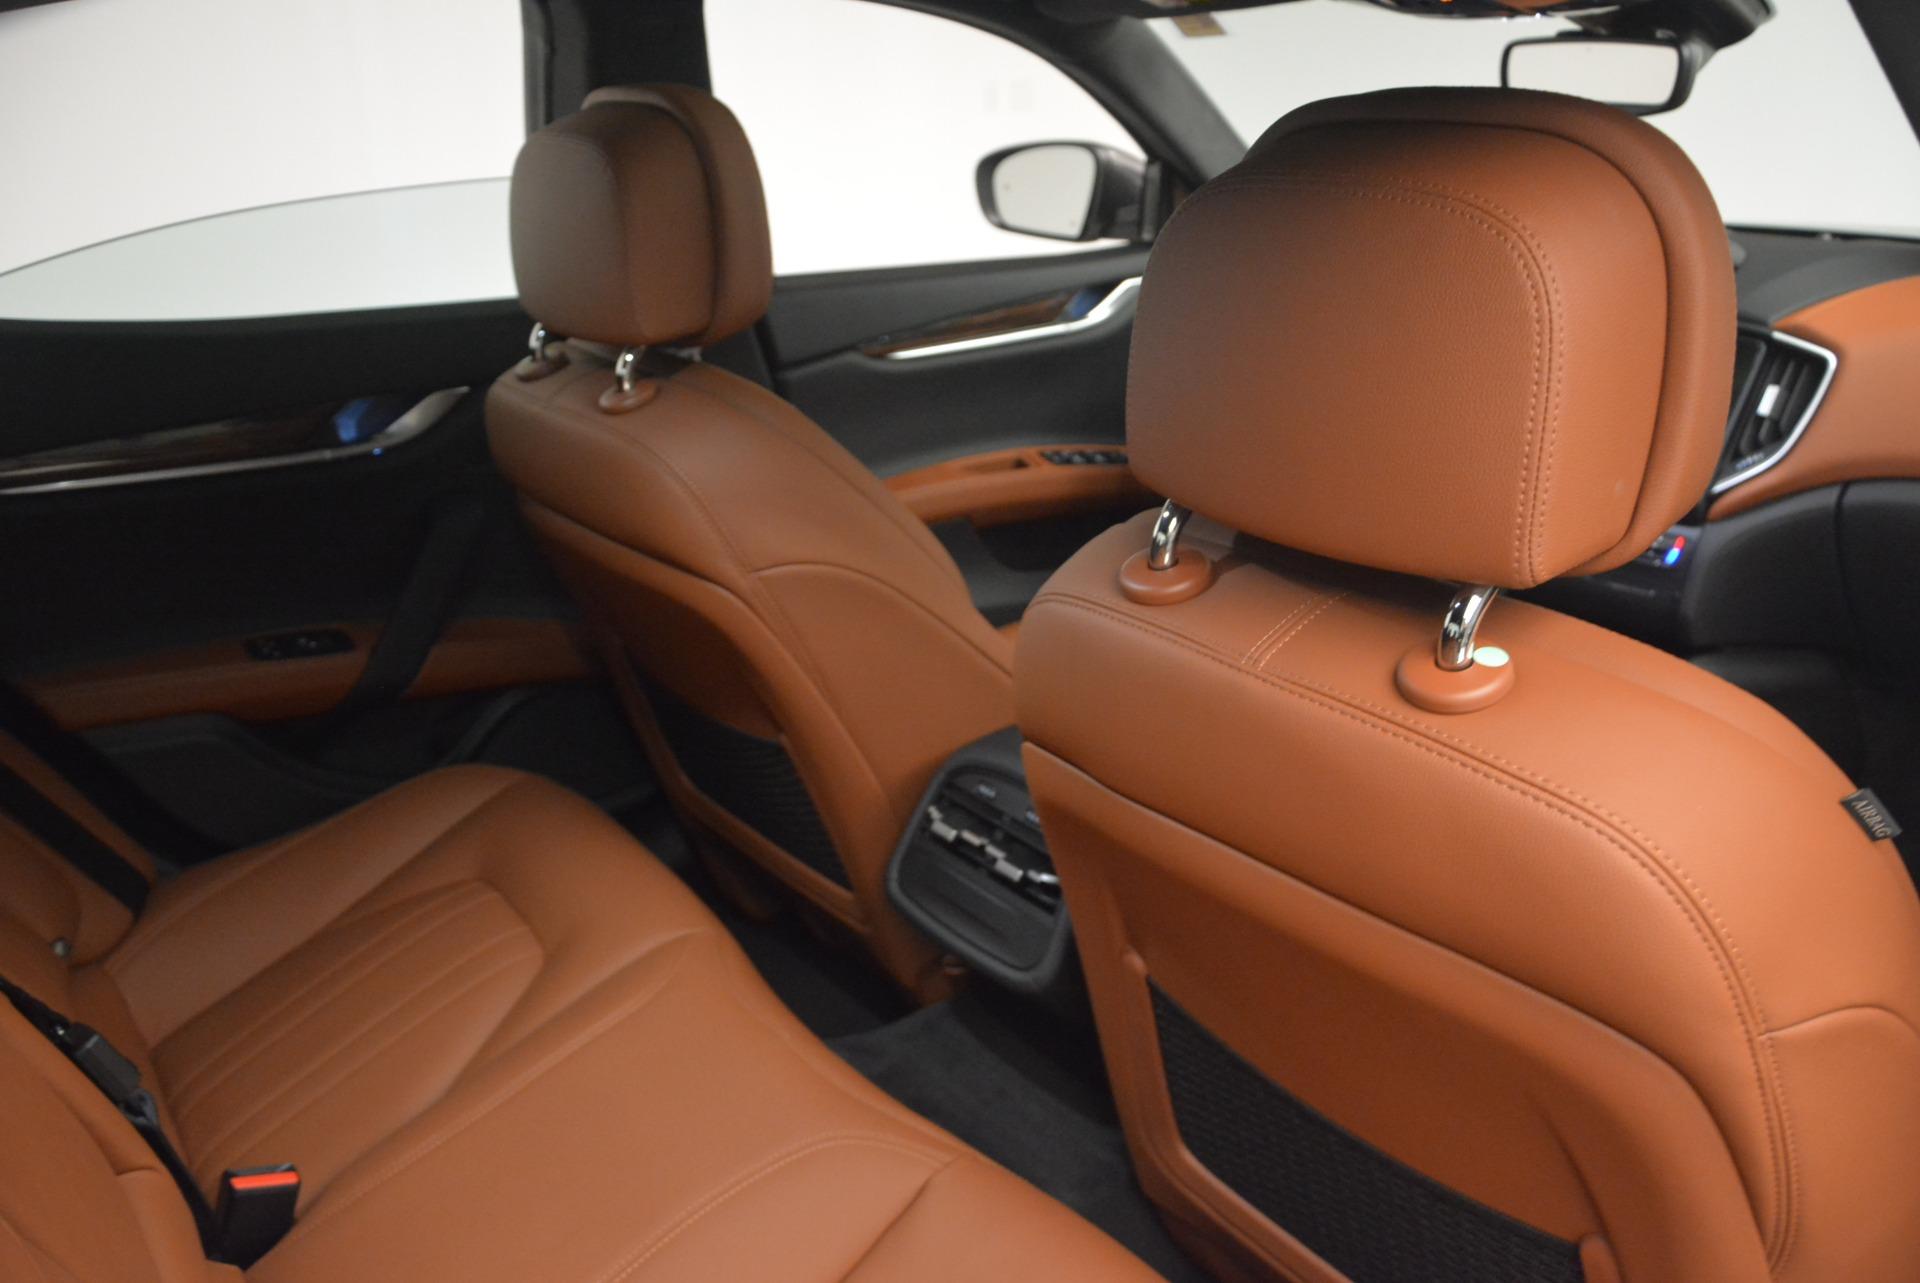 Used 2018 Maserati Ghibli S Q4 For Sale In Westport, CT 1566_p17